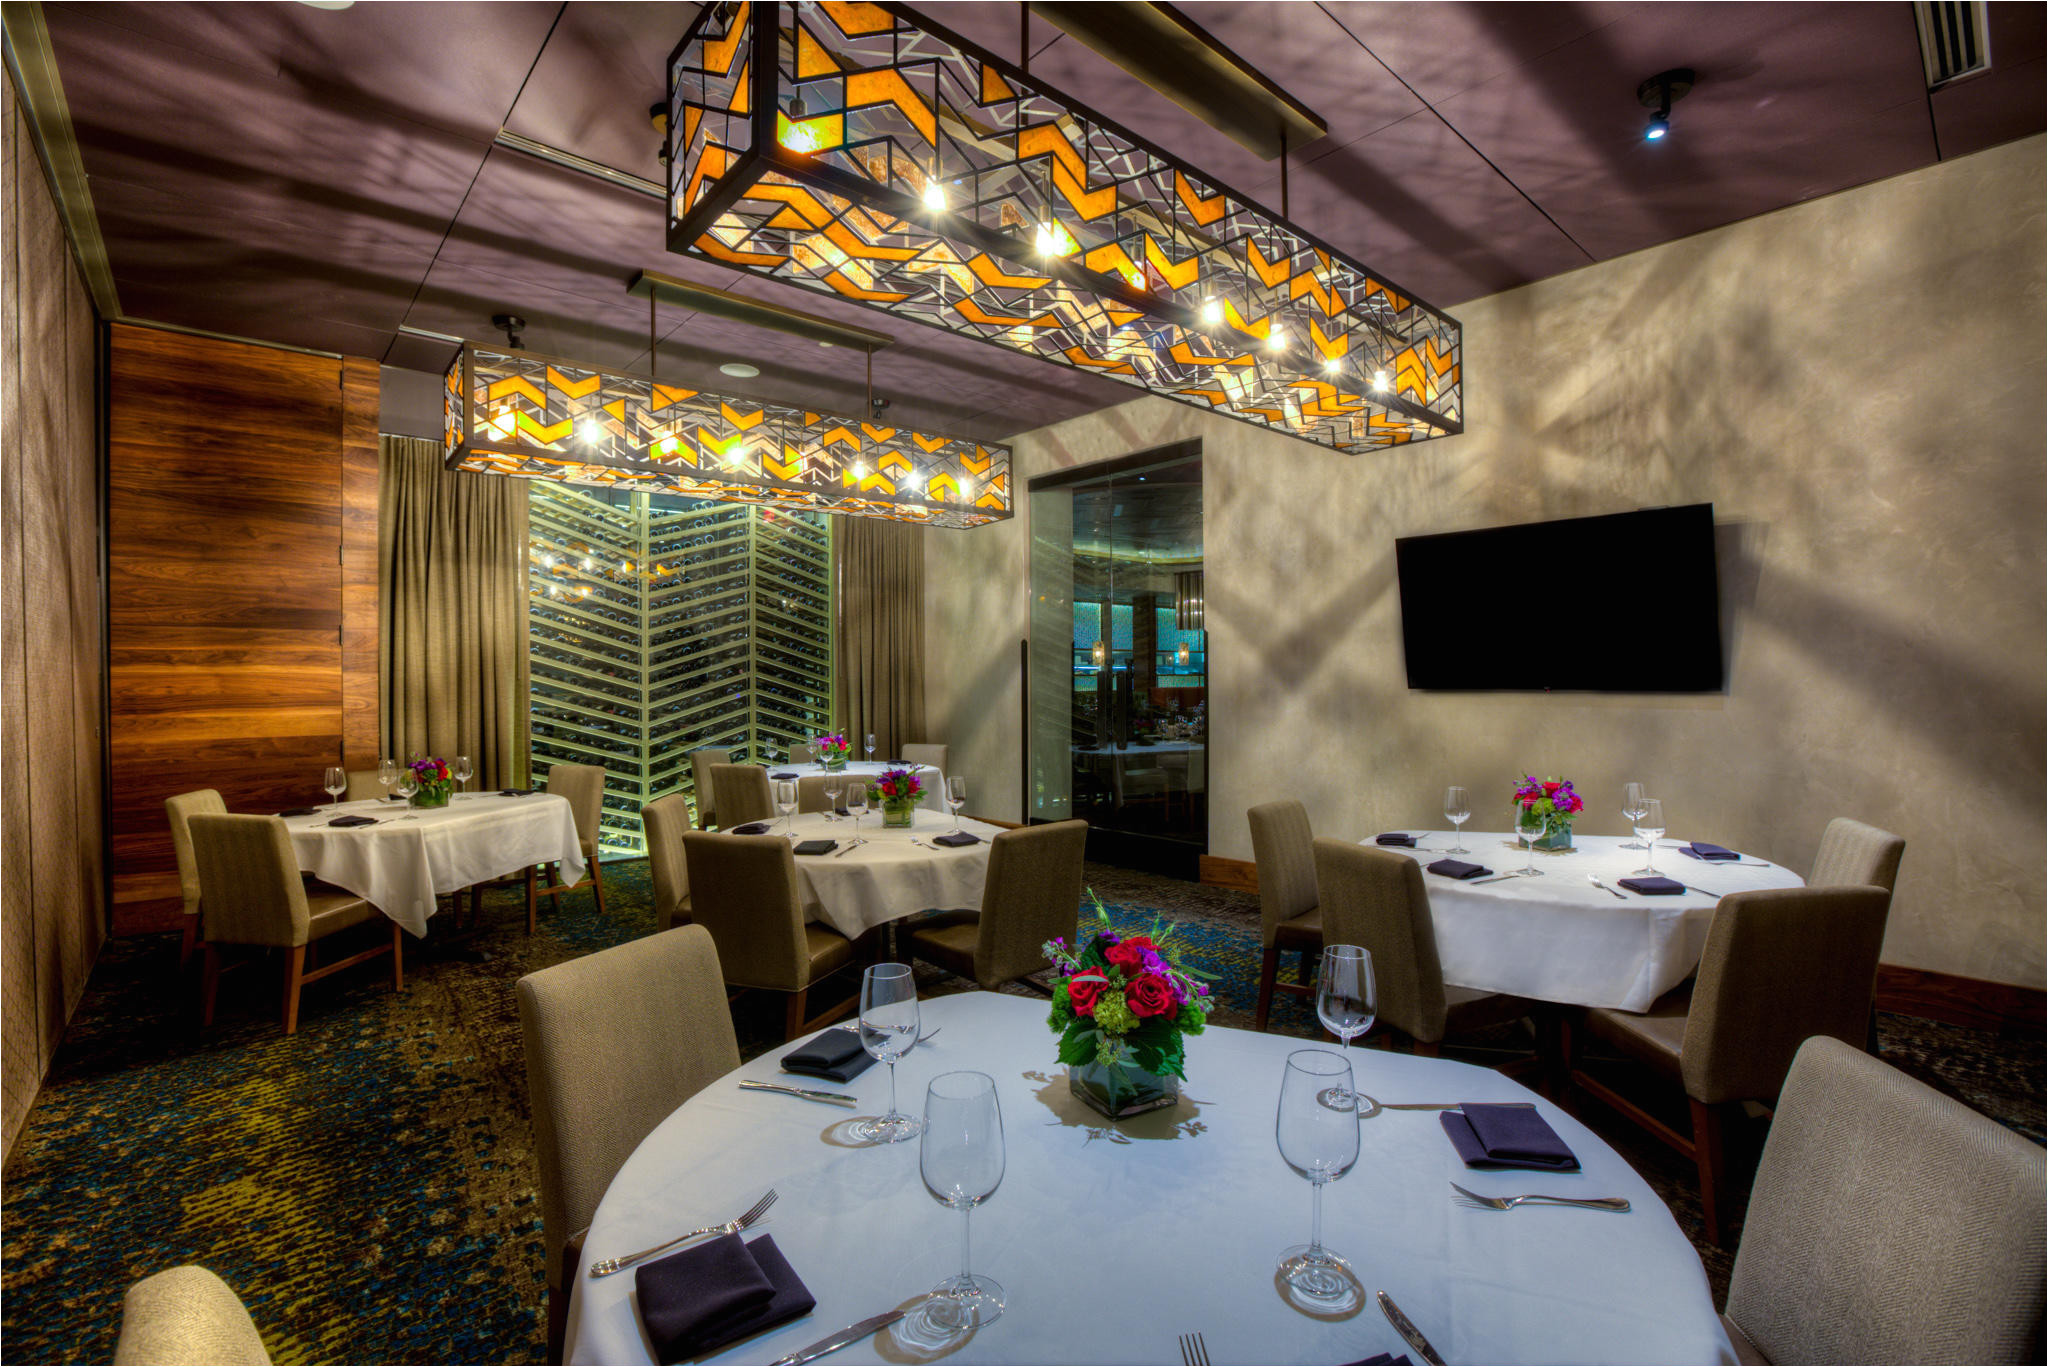 del frisco s double eagle steakhouse orlando oak room half cellar private dining room